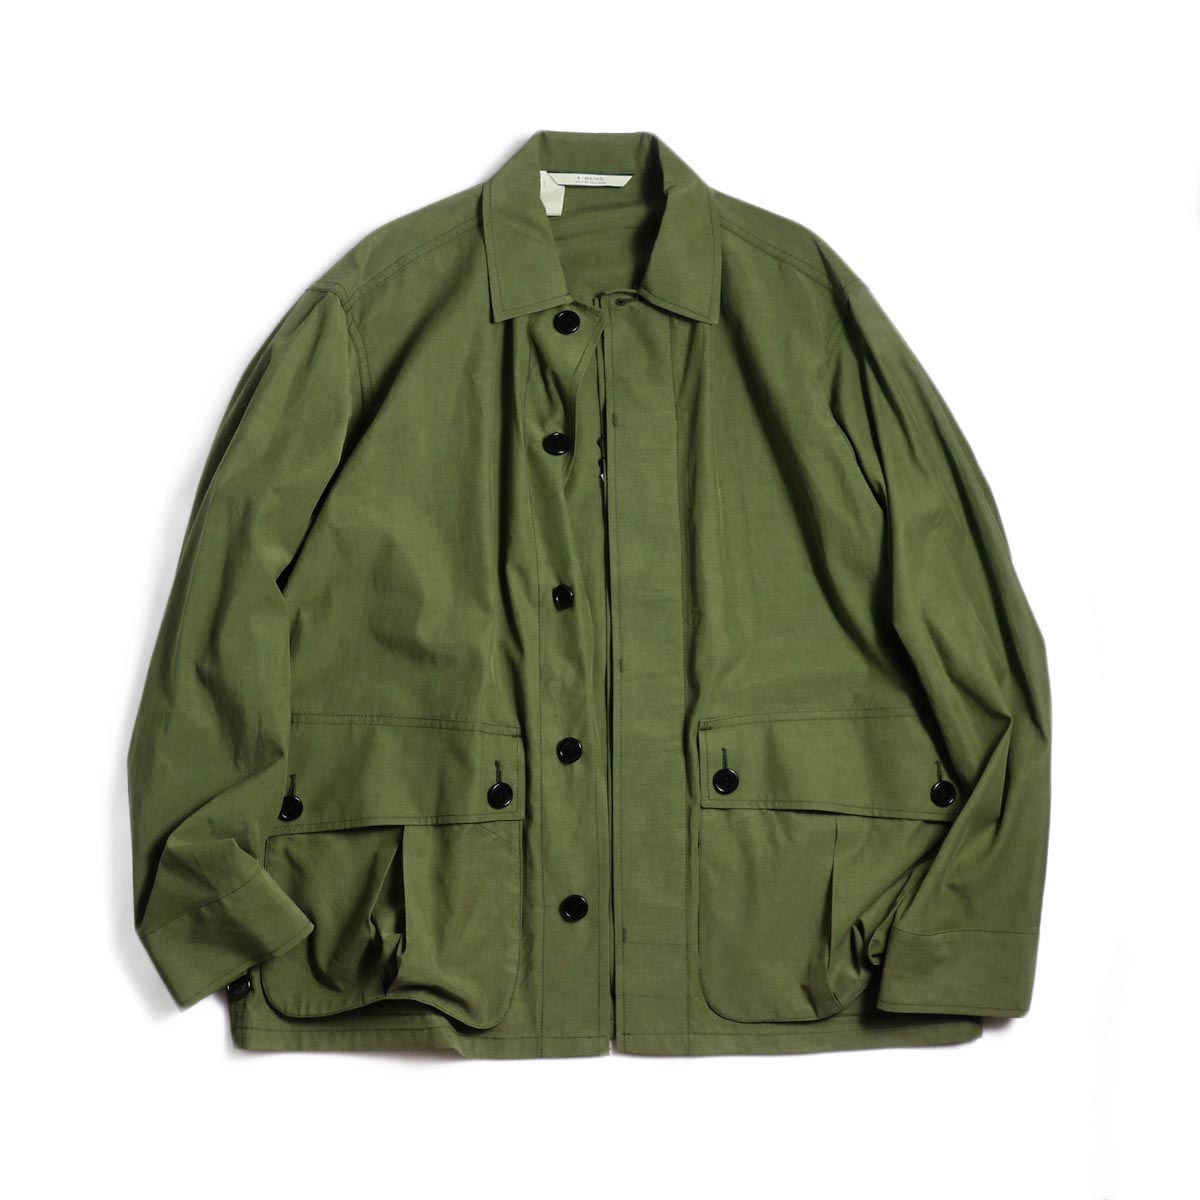 N.HOOLYWOOD / 191-BL09 Hunting Coverall Jacket -Khaki